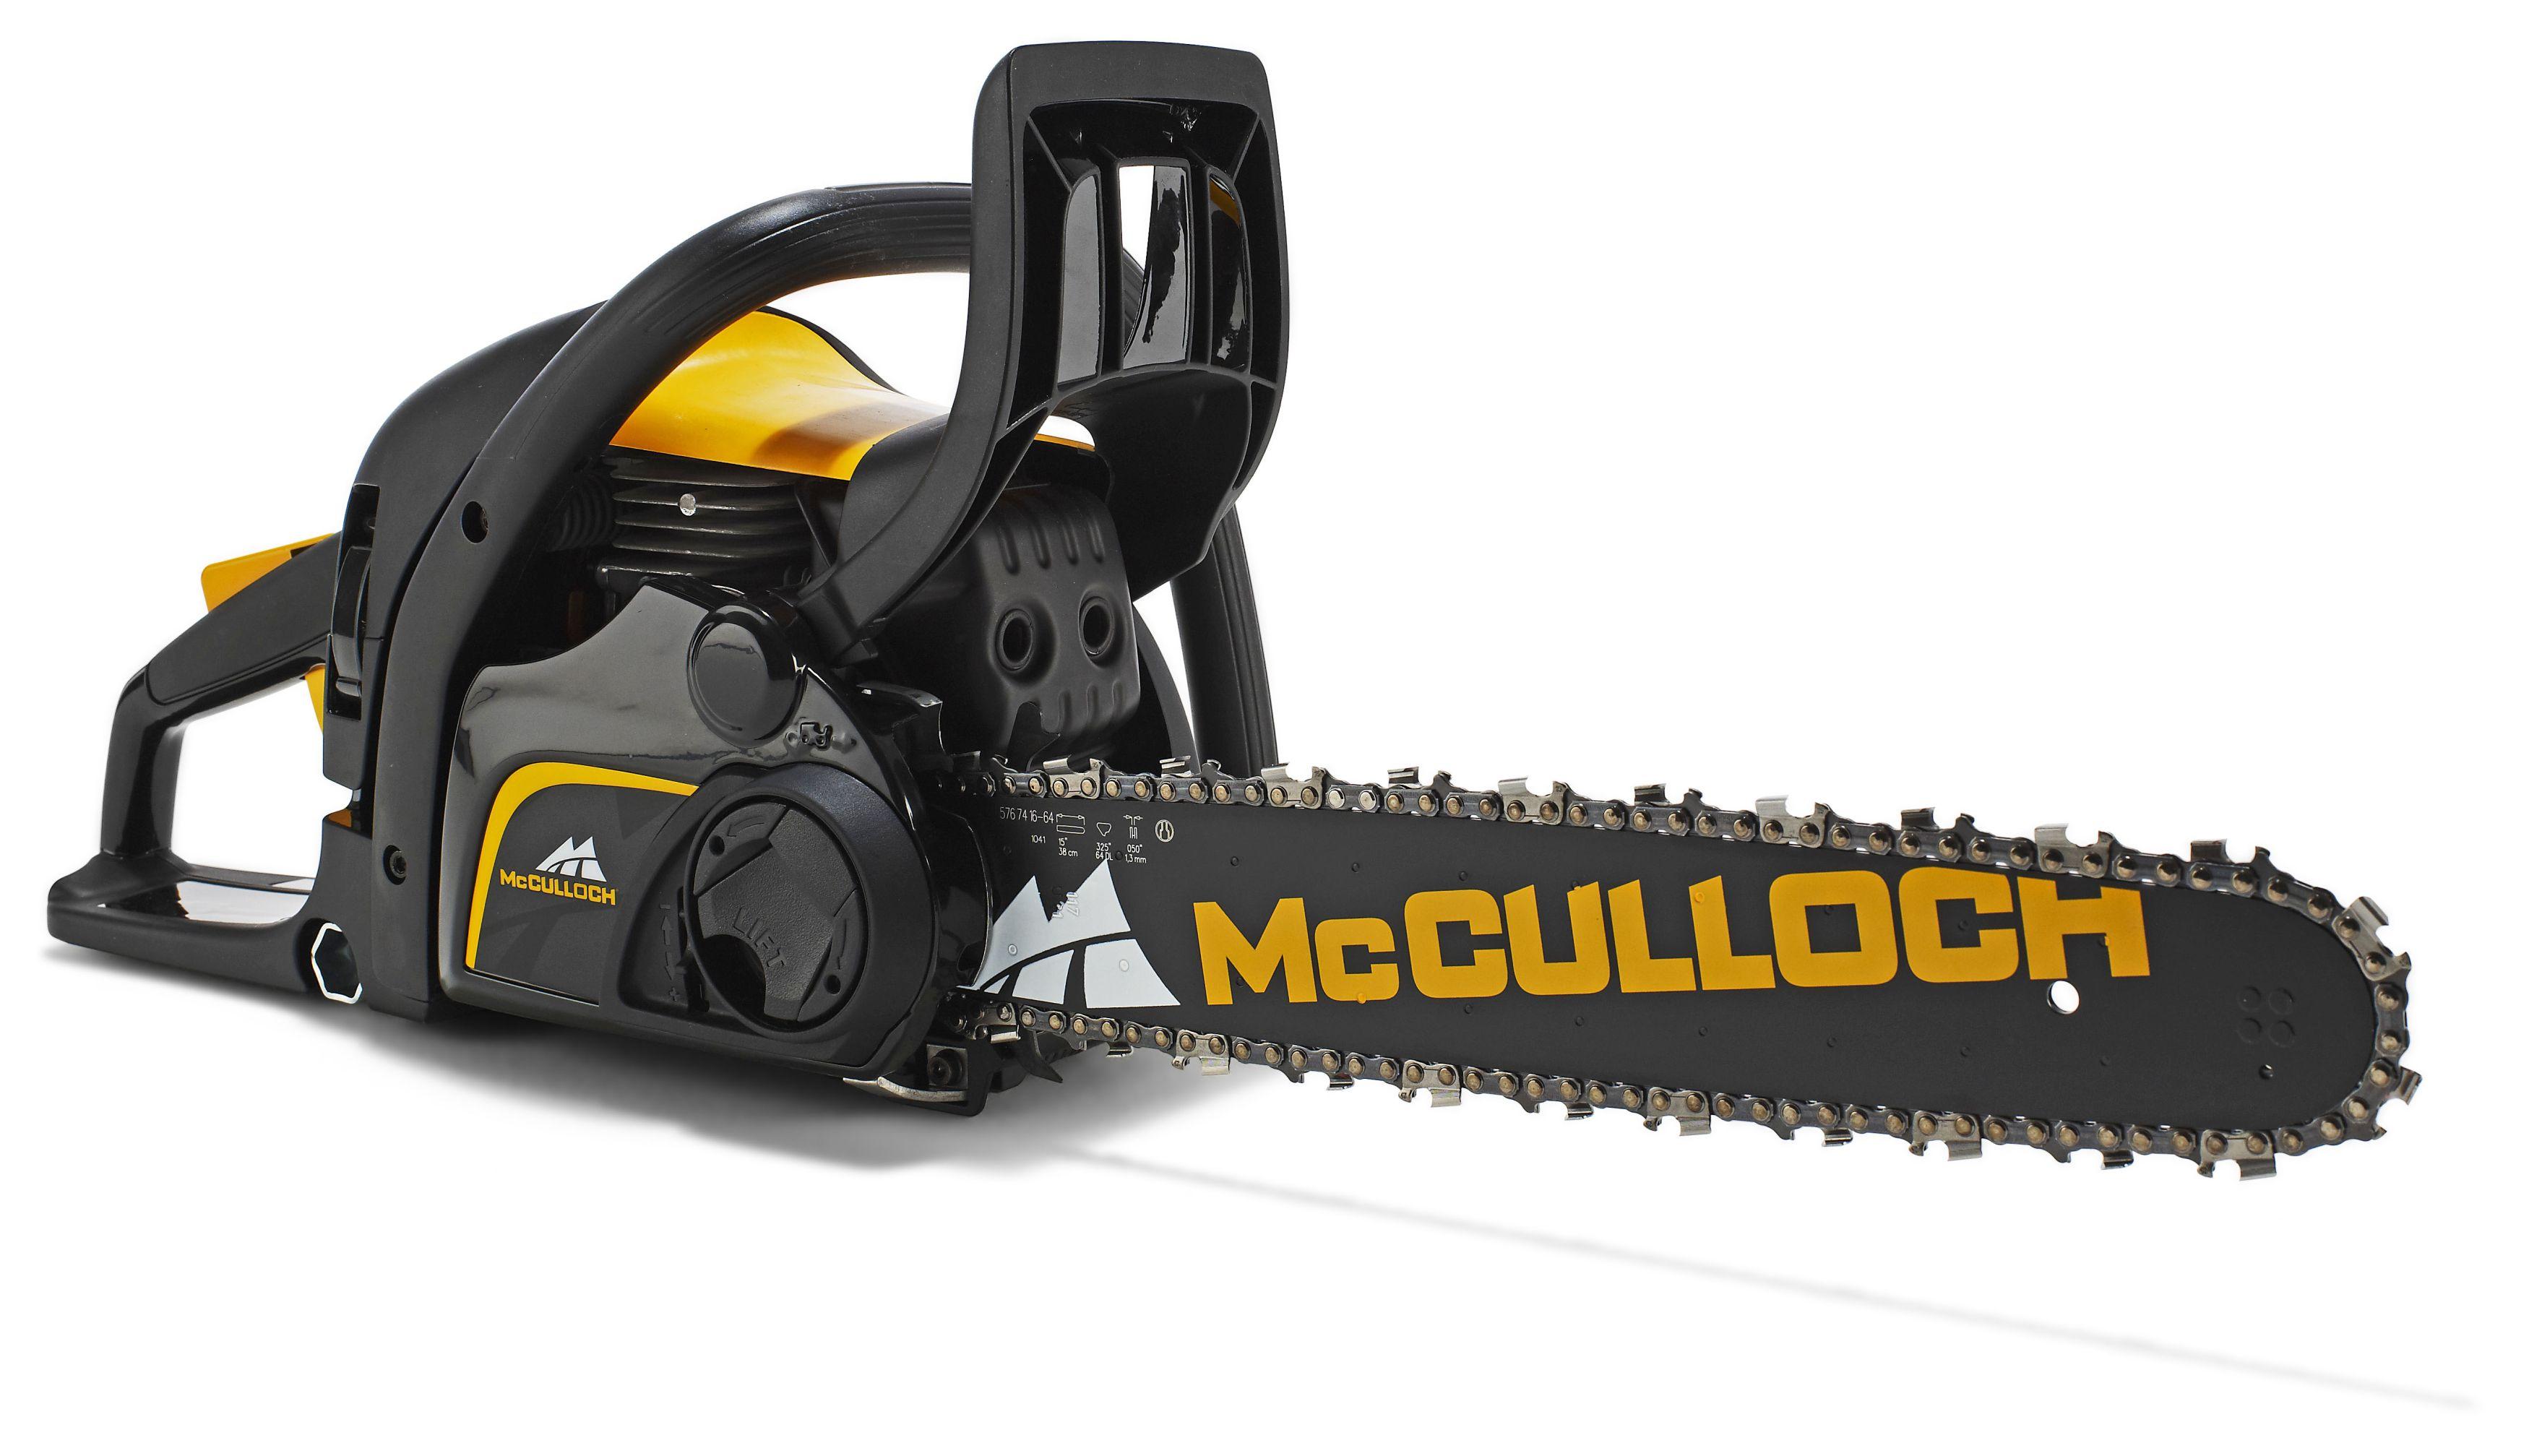 McCulloch chainsaw CS 410 Elite - Husqvarna AB